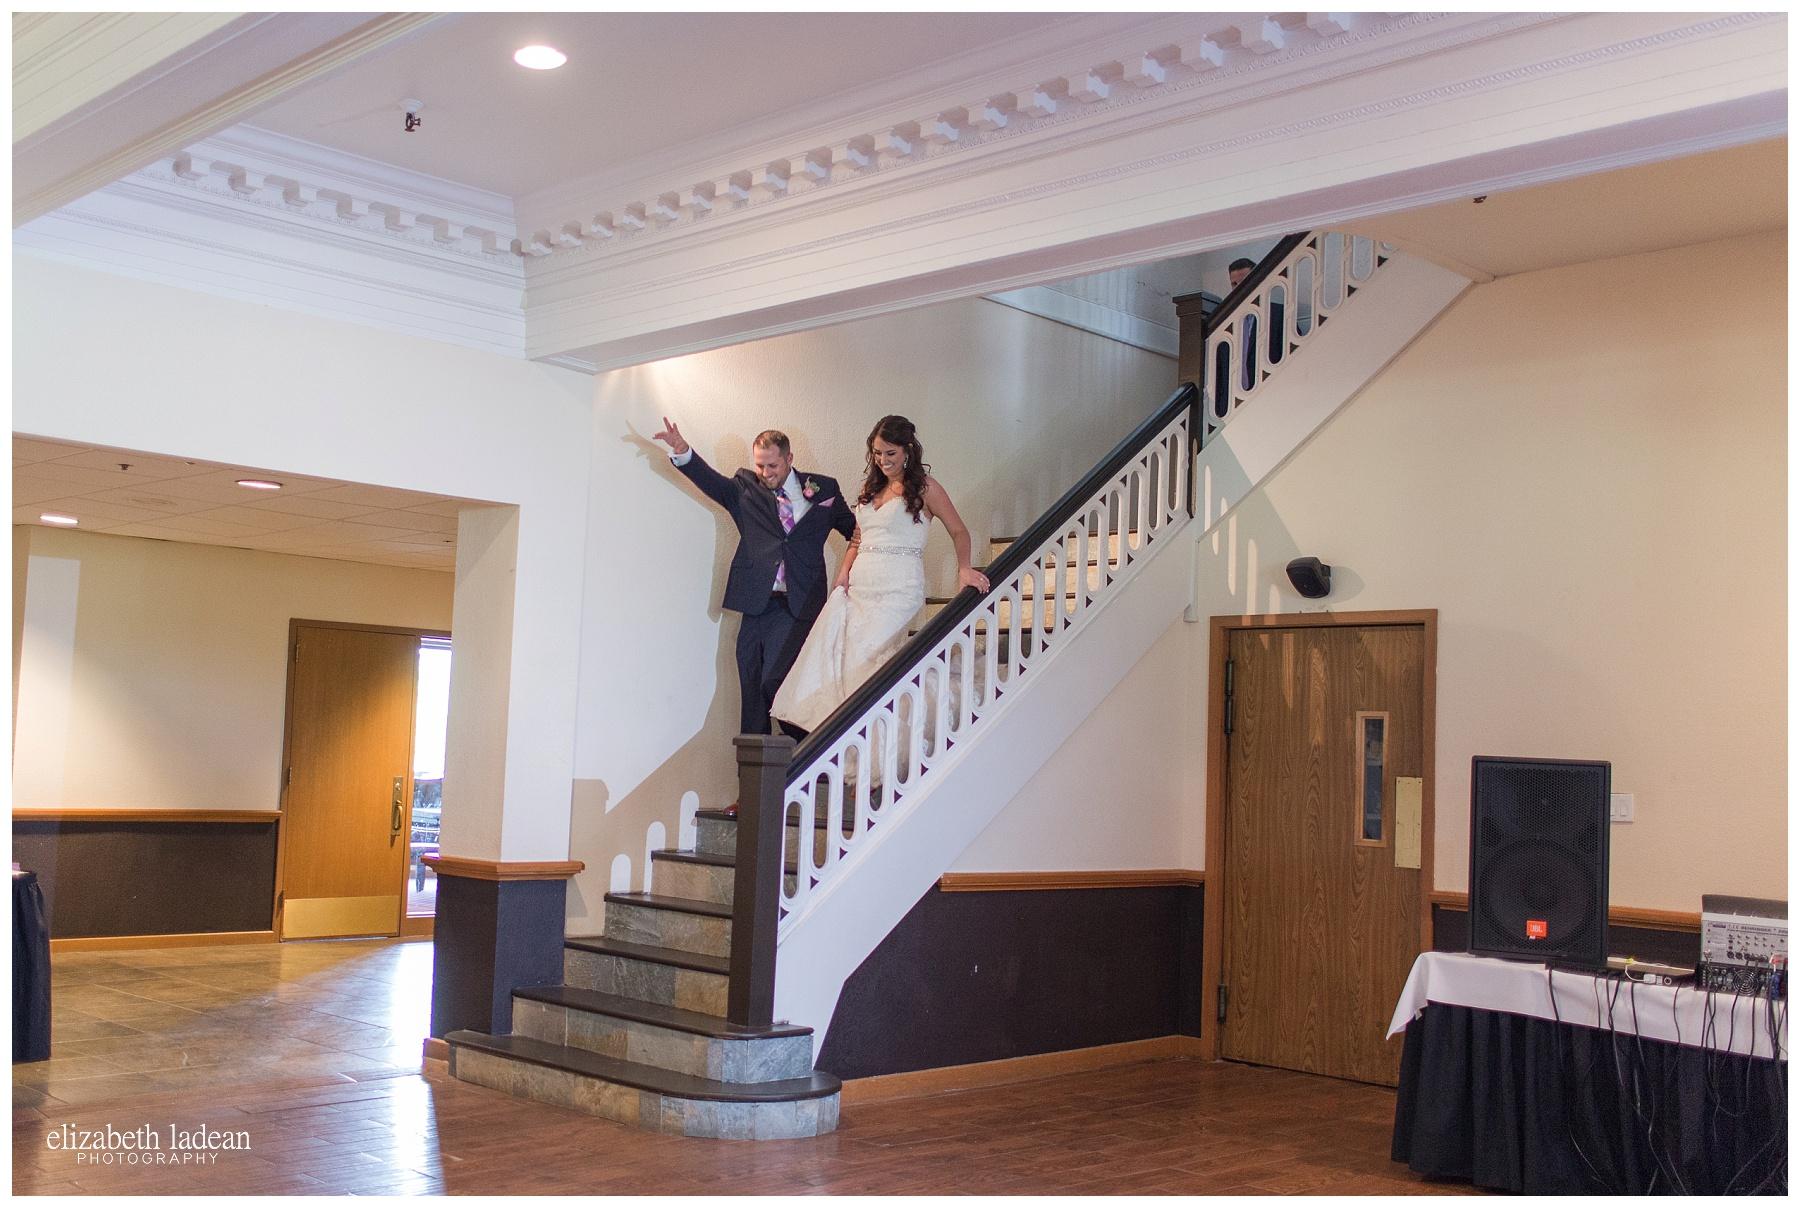 Hillcrest-Country-Club-Kansas-City-Wedding-Photography-E+J-0520-Elizabeth-Ladean-Photography-photo_0855.jpg